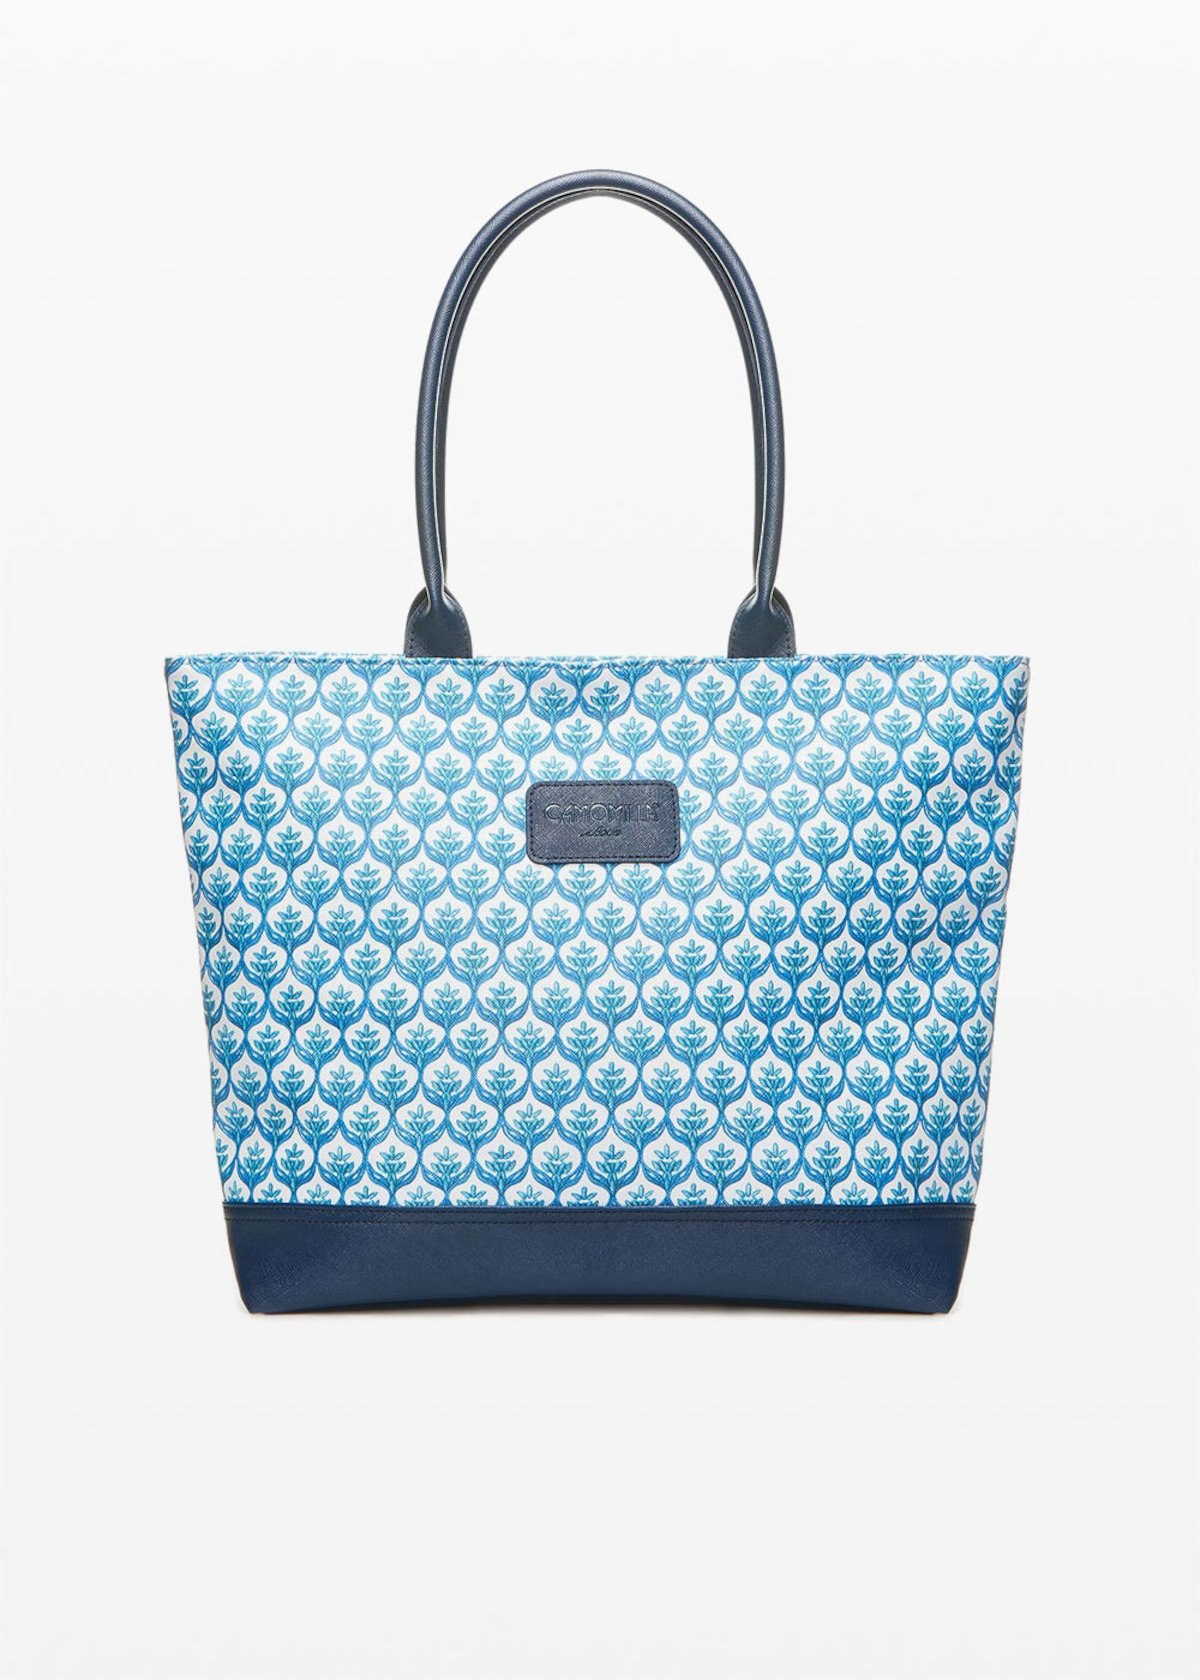 Trenmaiol shopping bag with double handles - White / Avion  Fantasia - Woman